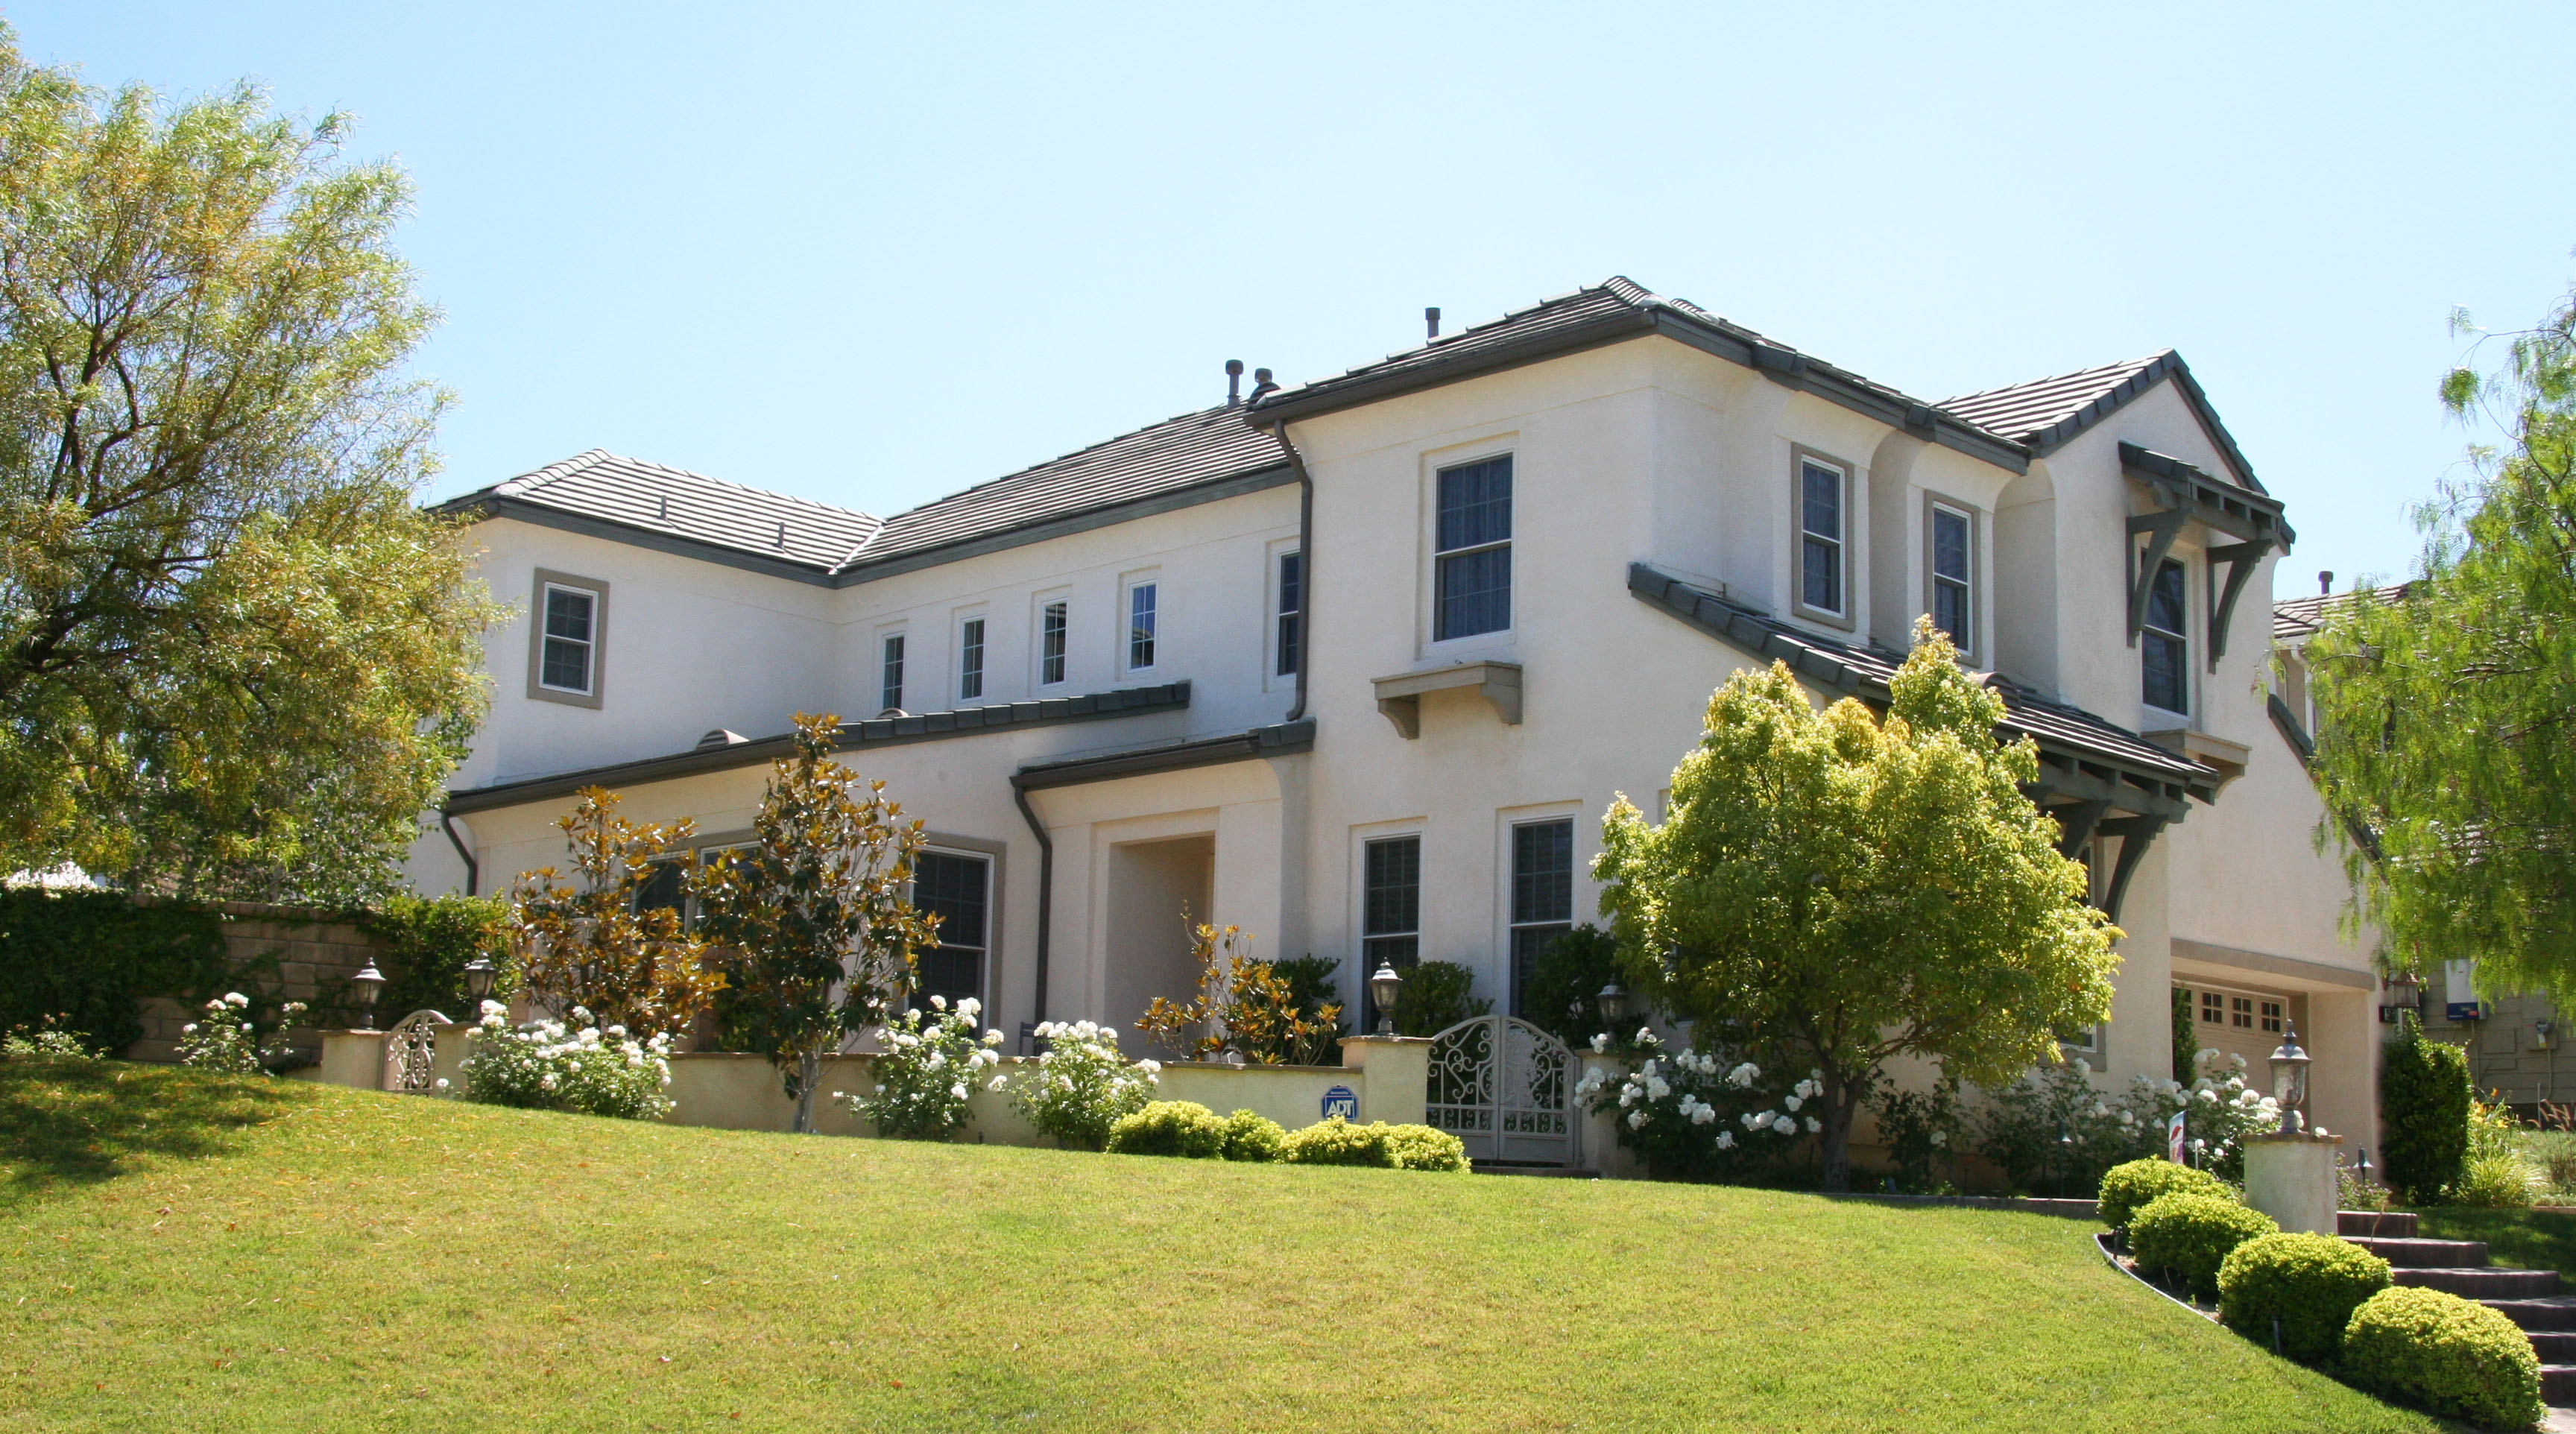 Valencia westridge homes and real estate westridge for Valencia home